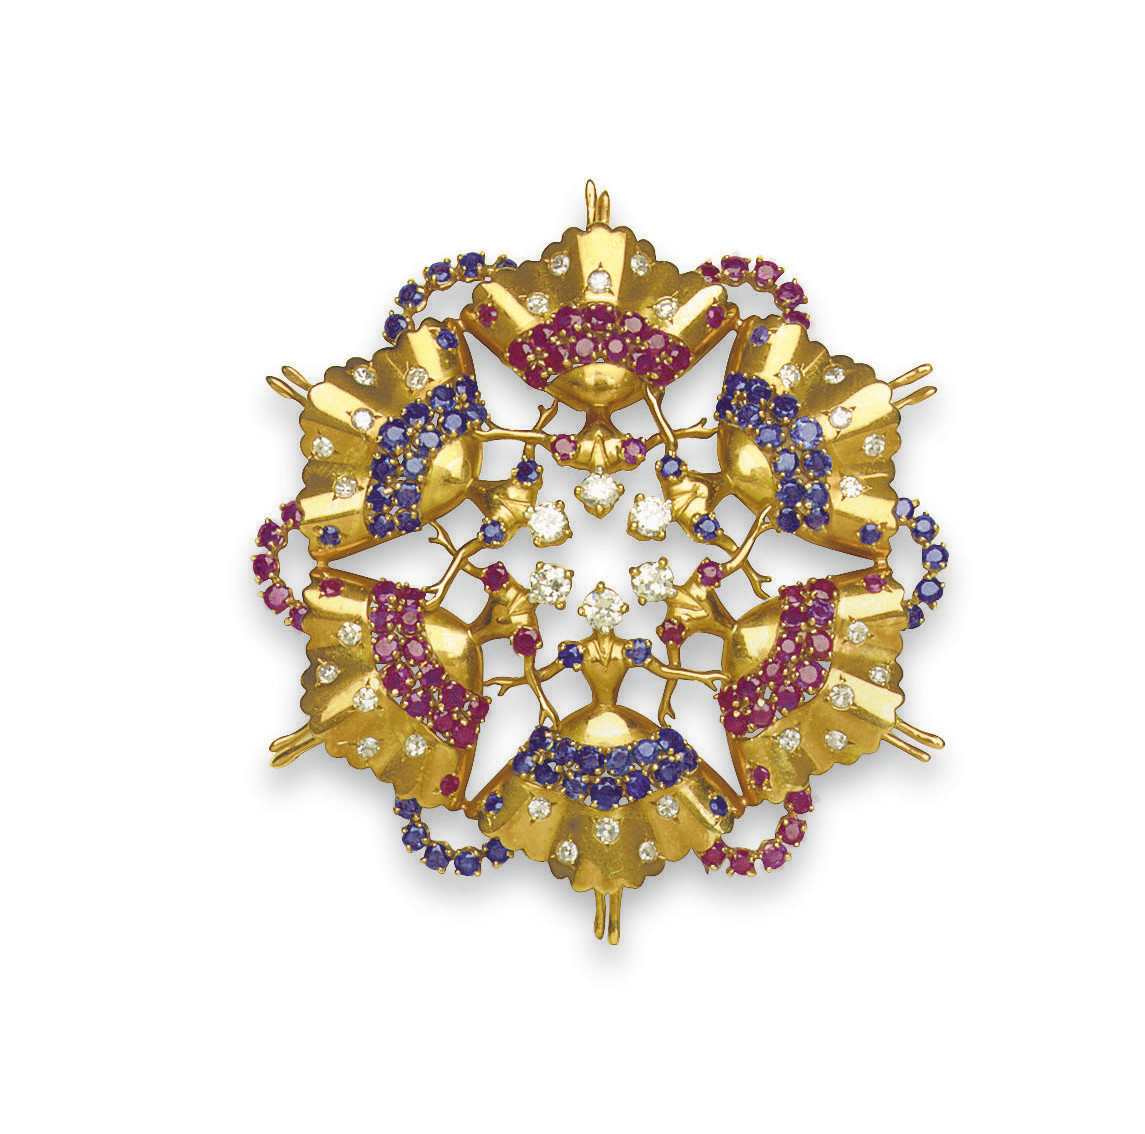 "A RETRO DIAMOND, SAPPHIRE AND RUBY ""ROCKETTE"" BROOCH, BY JOHN RUBEL"